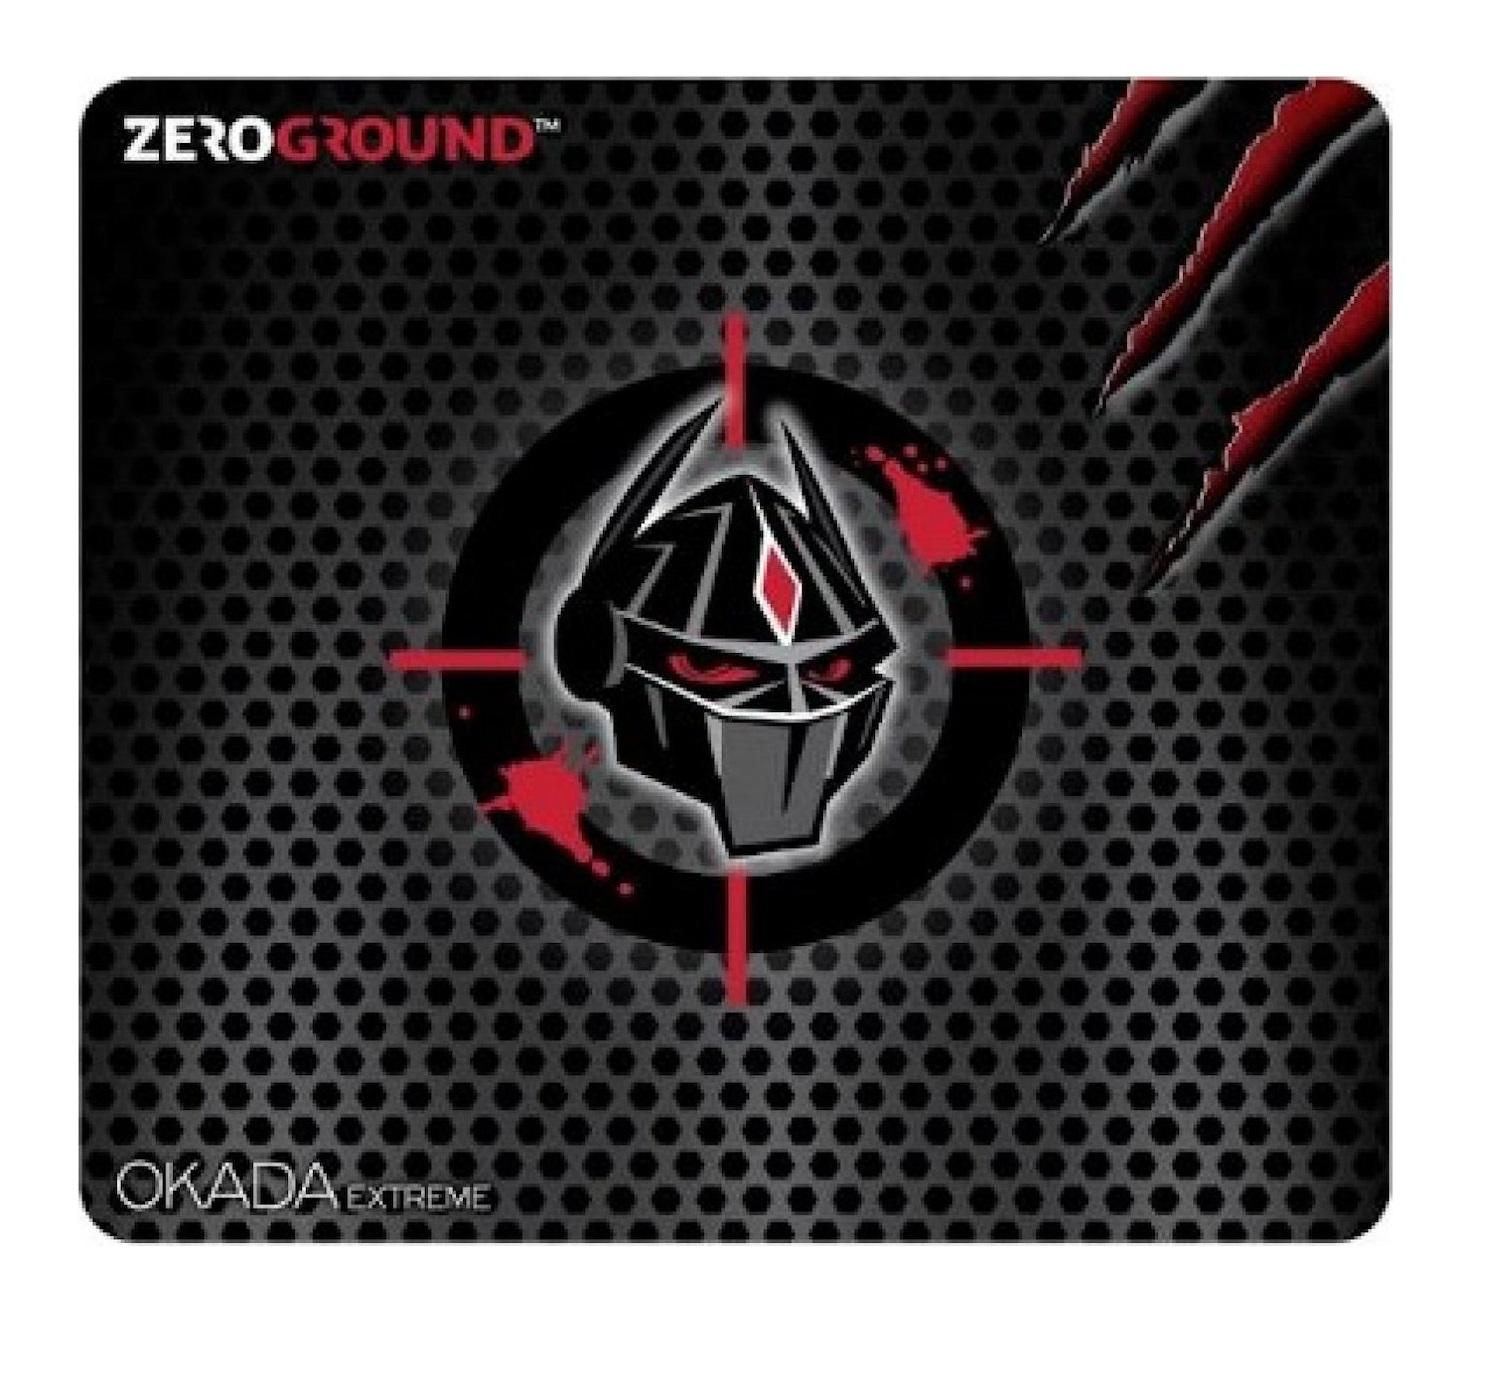 Zeroground MP-1700G Okada Extreme v2.0 Gaming Mousepad